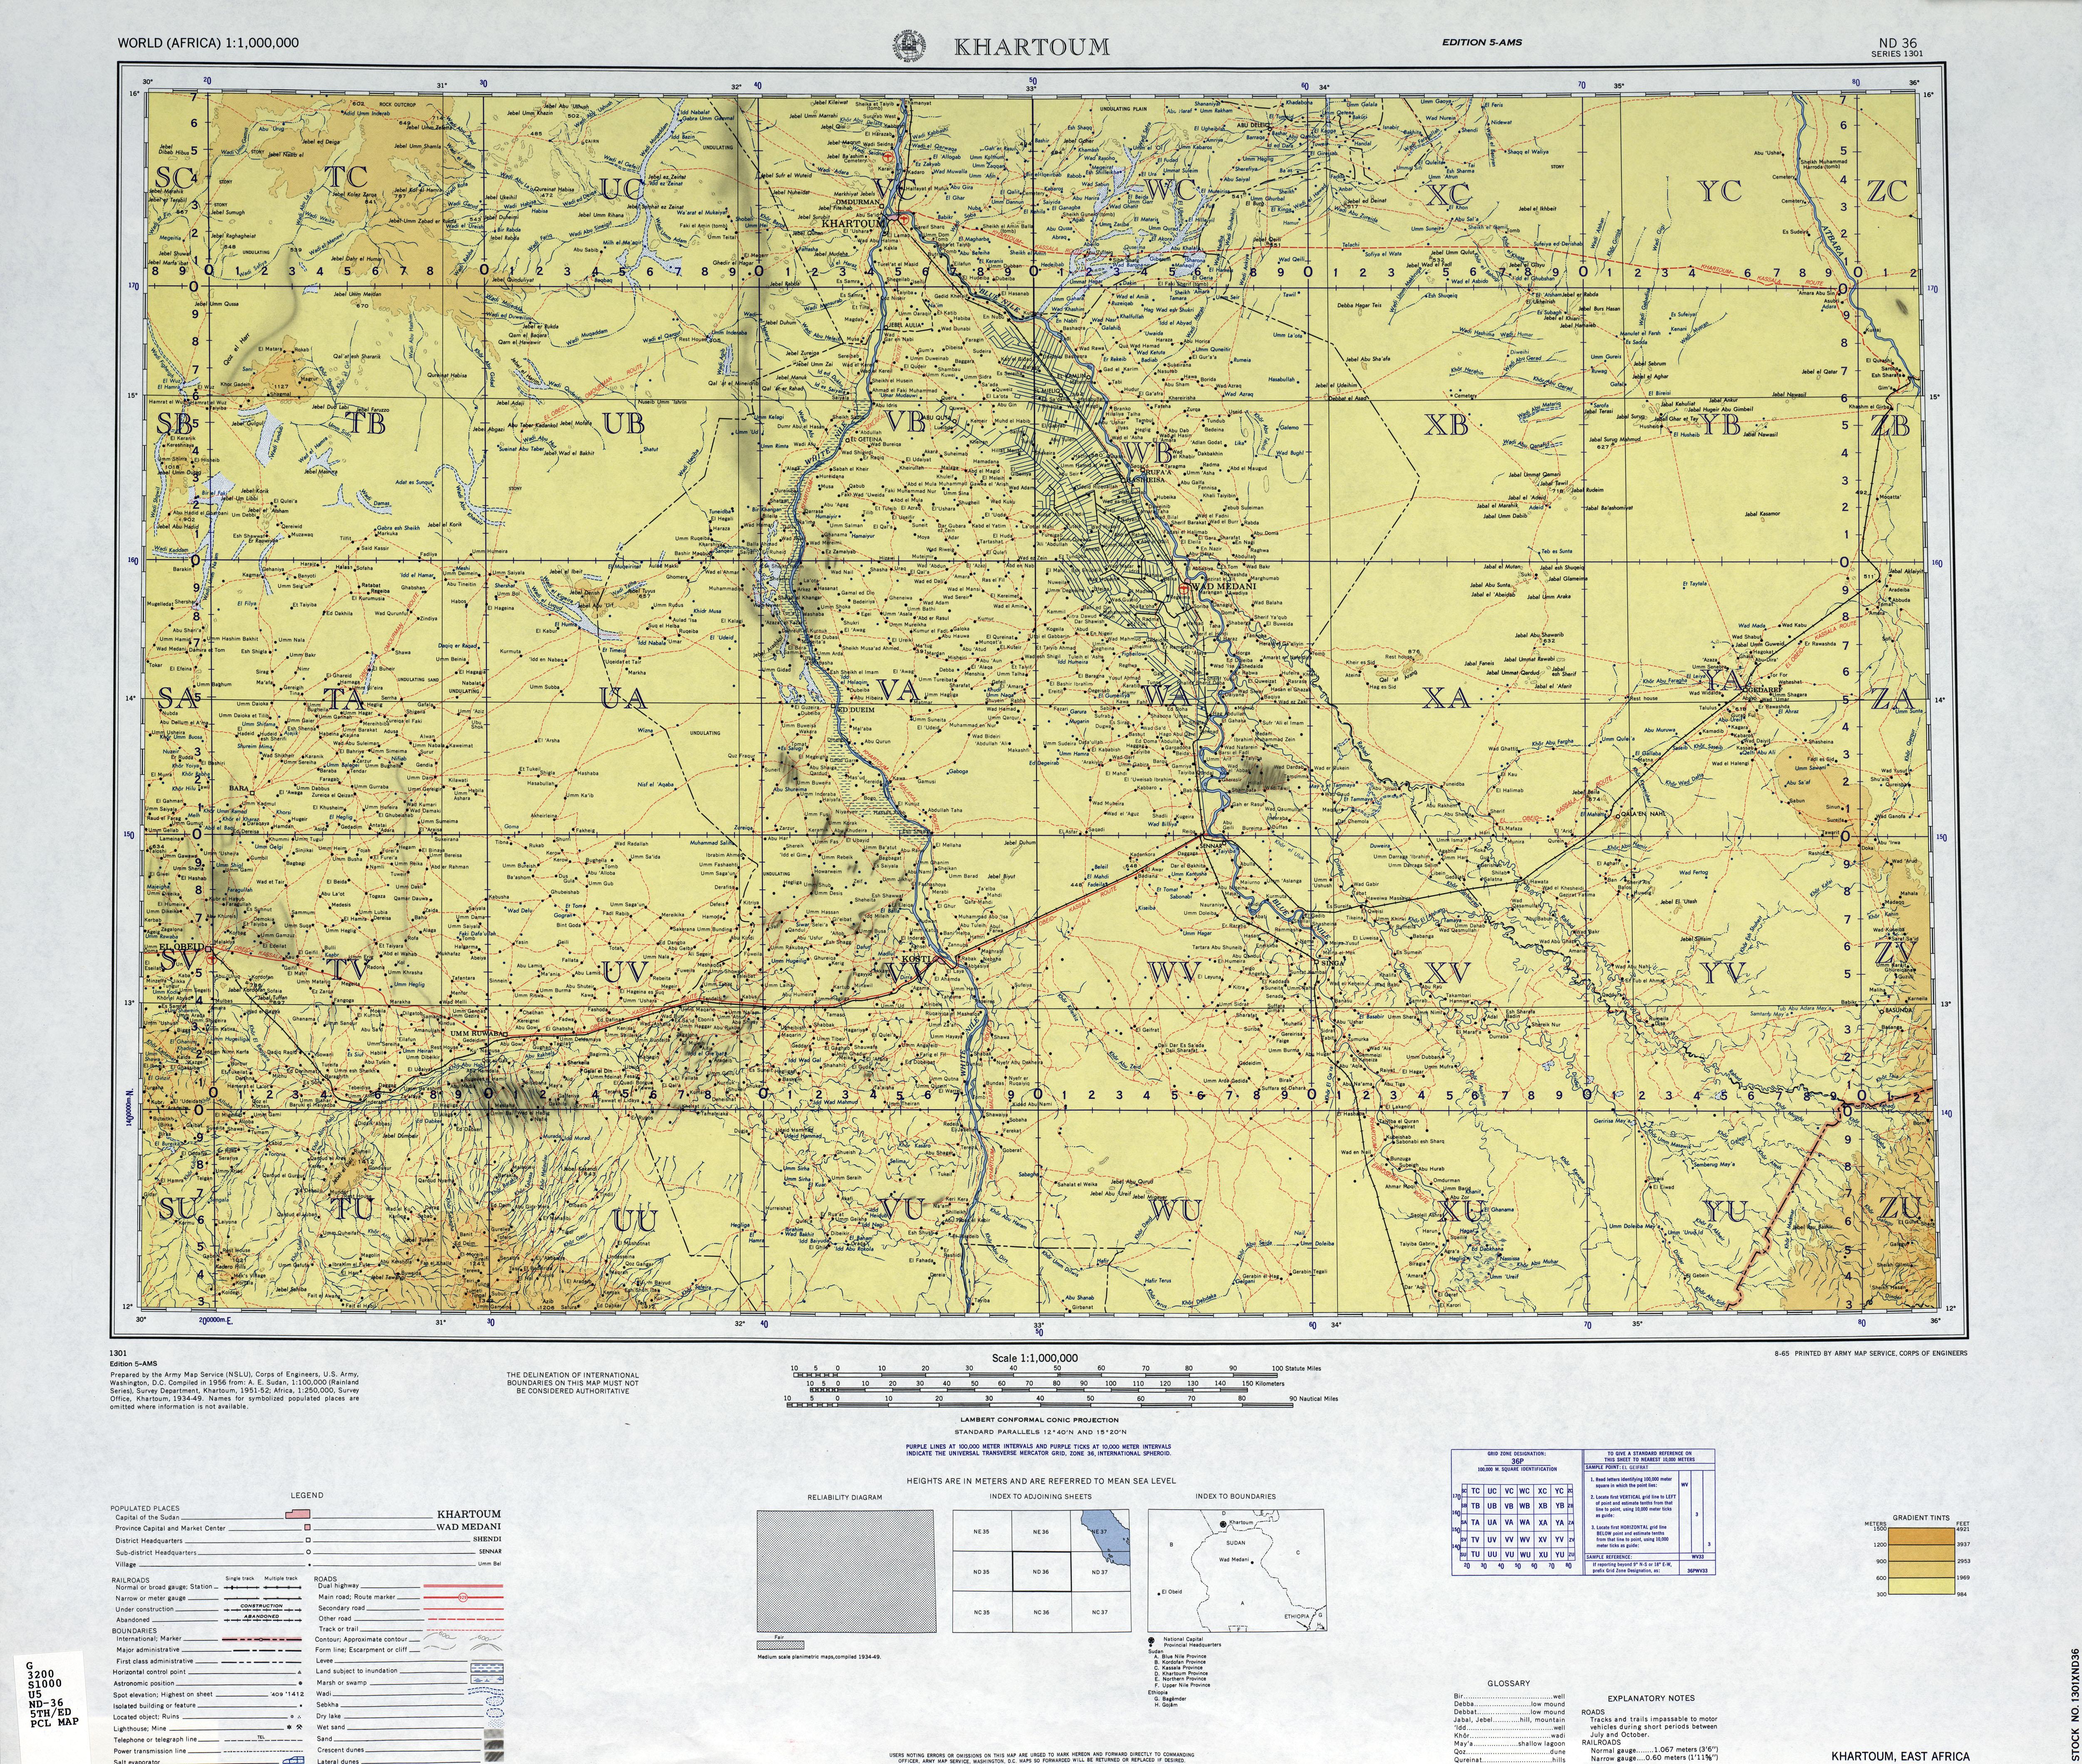 Sudan Condominium on atlas mountains map, egypt and sudan map, nile sudan map, damascus syria map, casablanca morocco map, accra ghana map, zambezi river africa map, south sudan region map, south sudan natural resources map, tehran map, istanbul turkey map, tripoli libya map, tel aviv map, dongola sudan map, nairobi map, riyadh map, nile river map, s. sudan map, mogadishu somalia map,